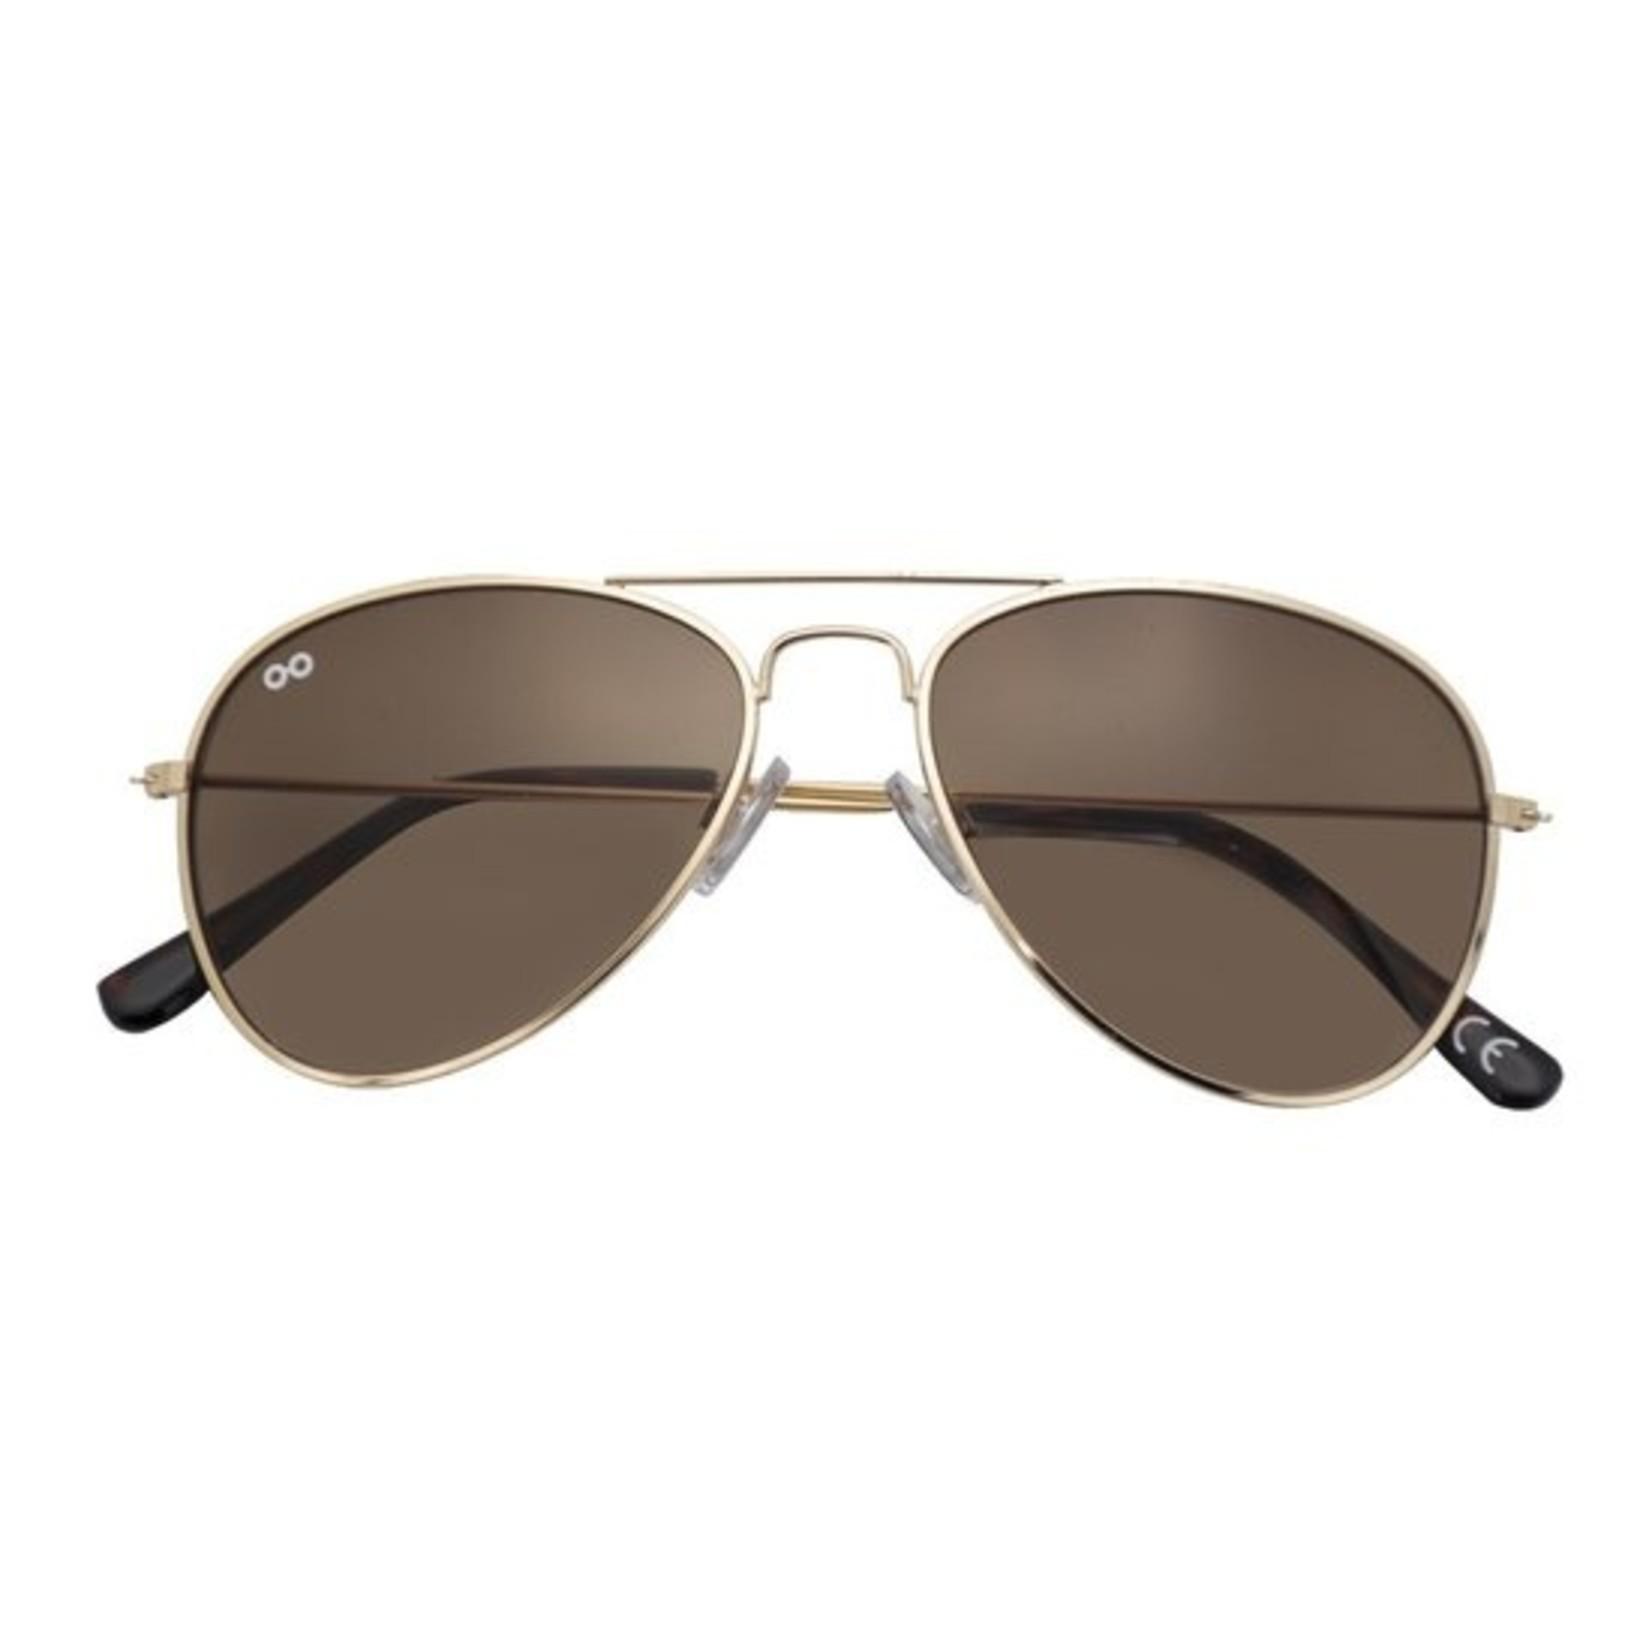 Croon Ann Satin Gold/Brown zonnebril pilotenbril